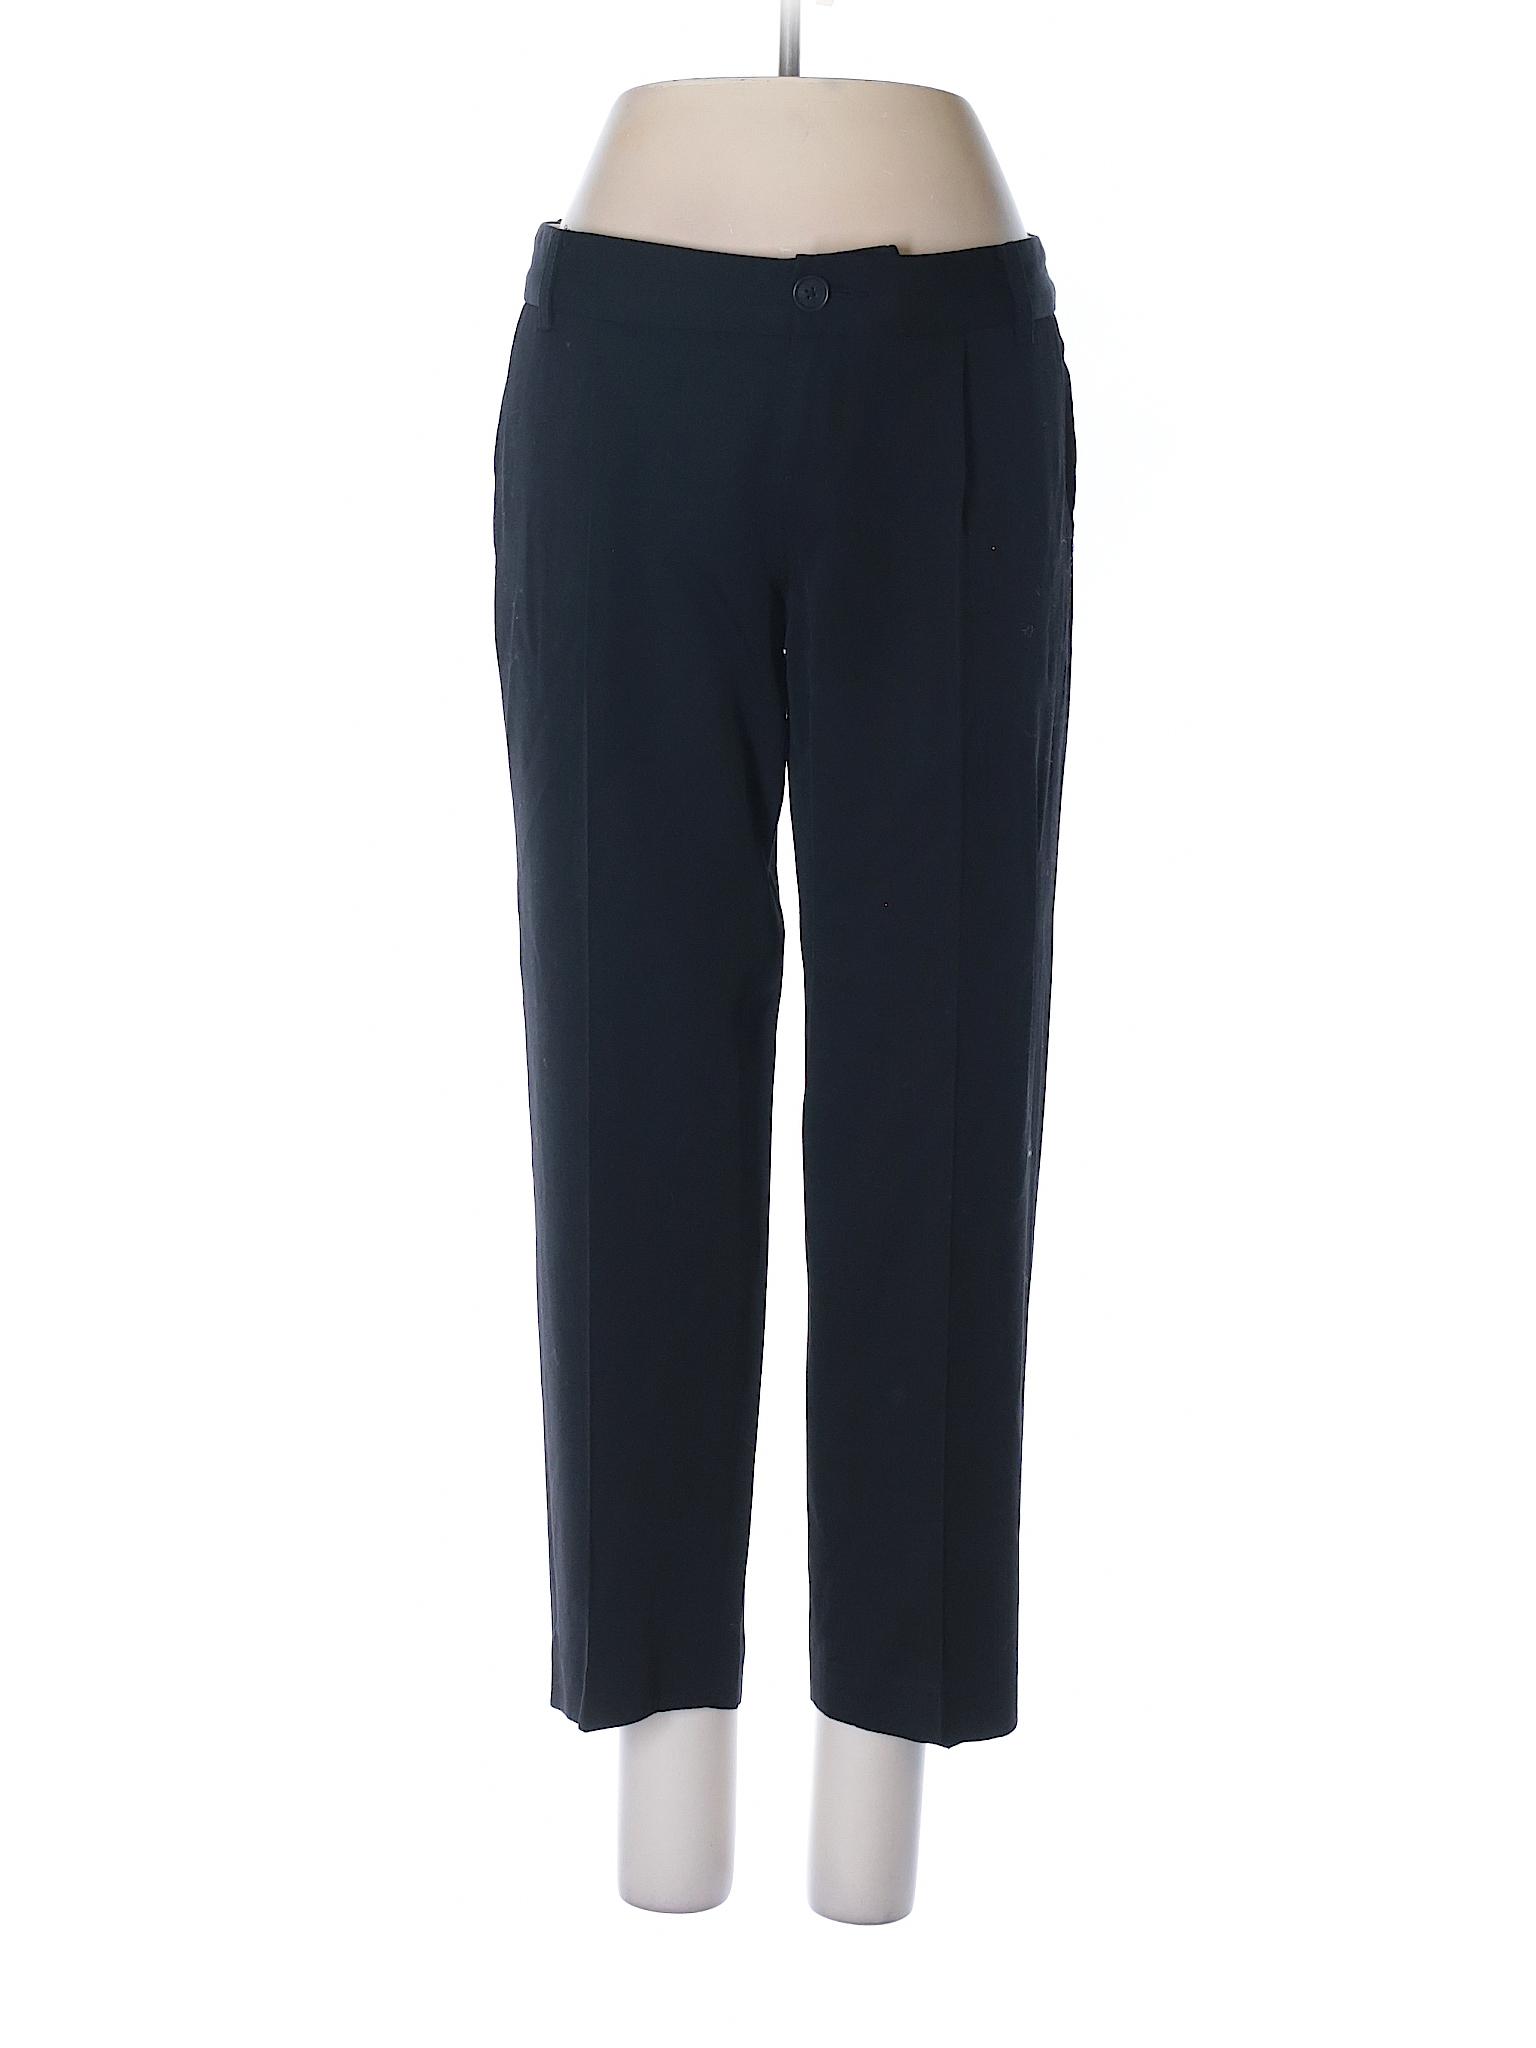 Wool Leisure Banana winter Pants Republic wx1Tqg